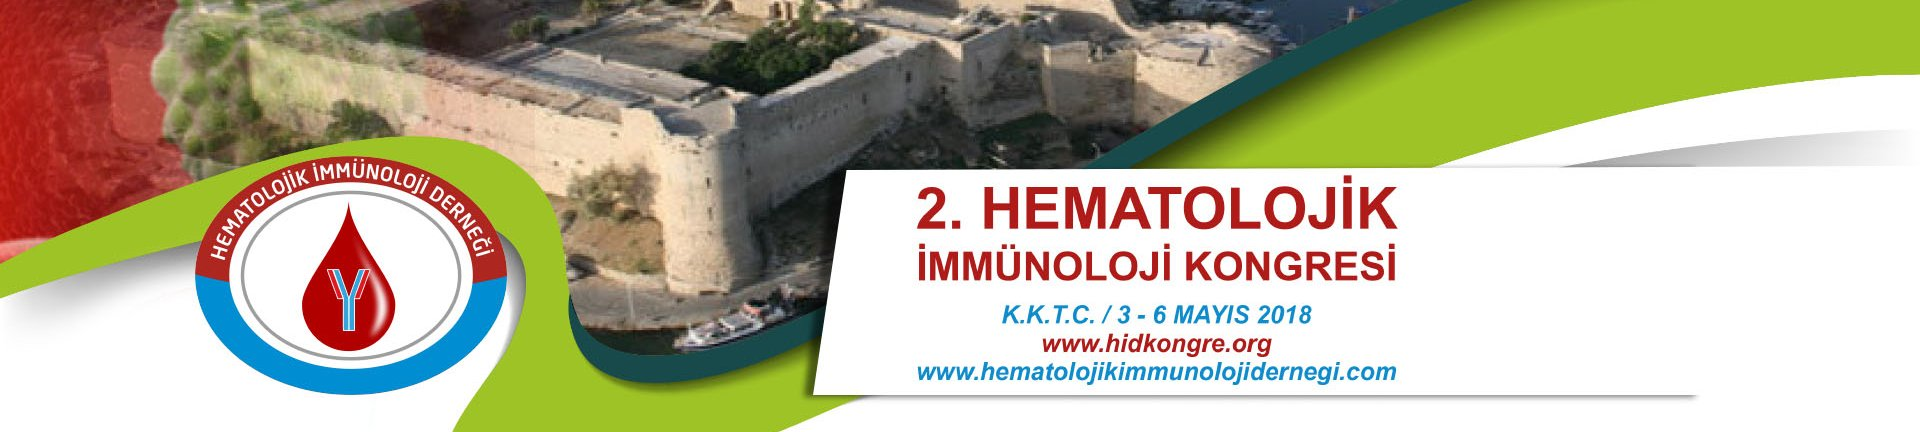 2. Hematolojik İmmünoloji Kongresi